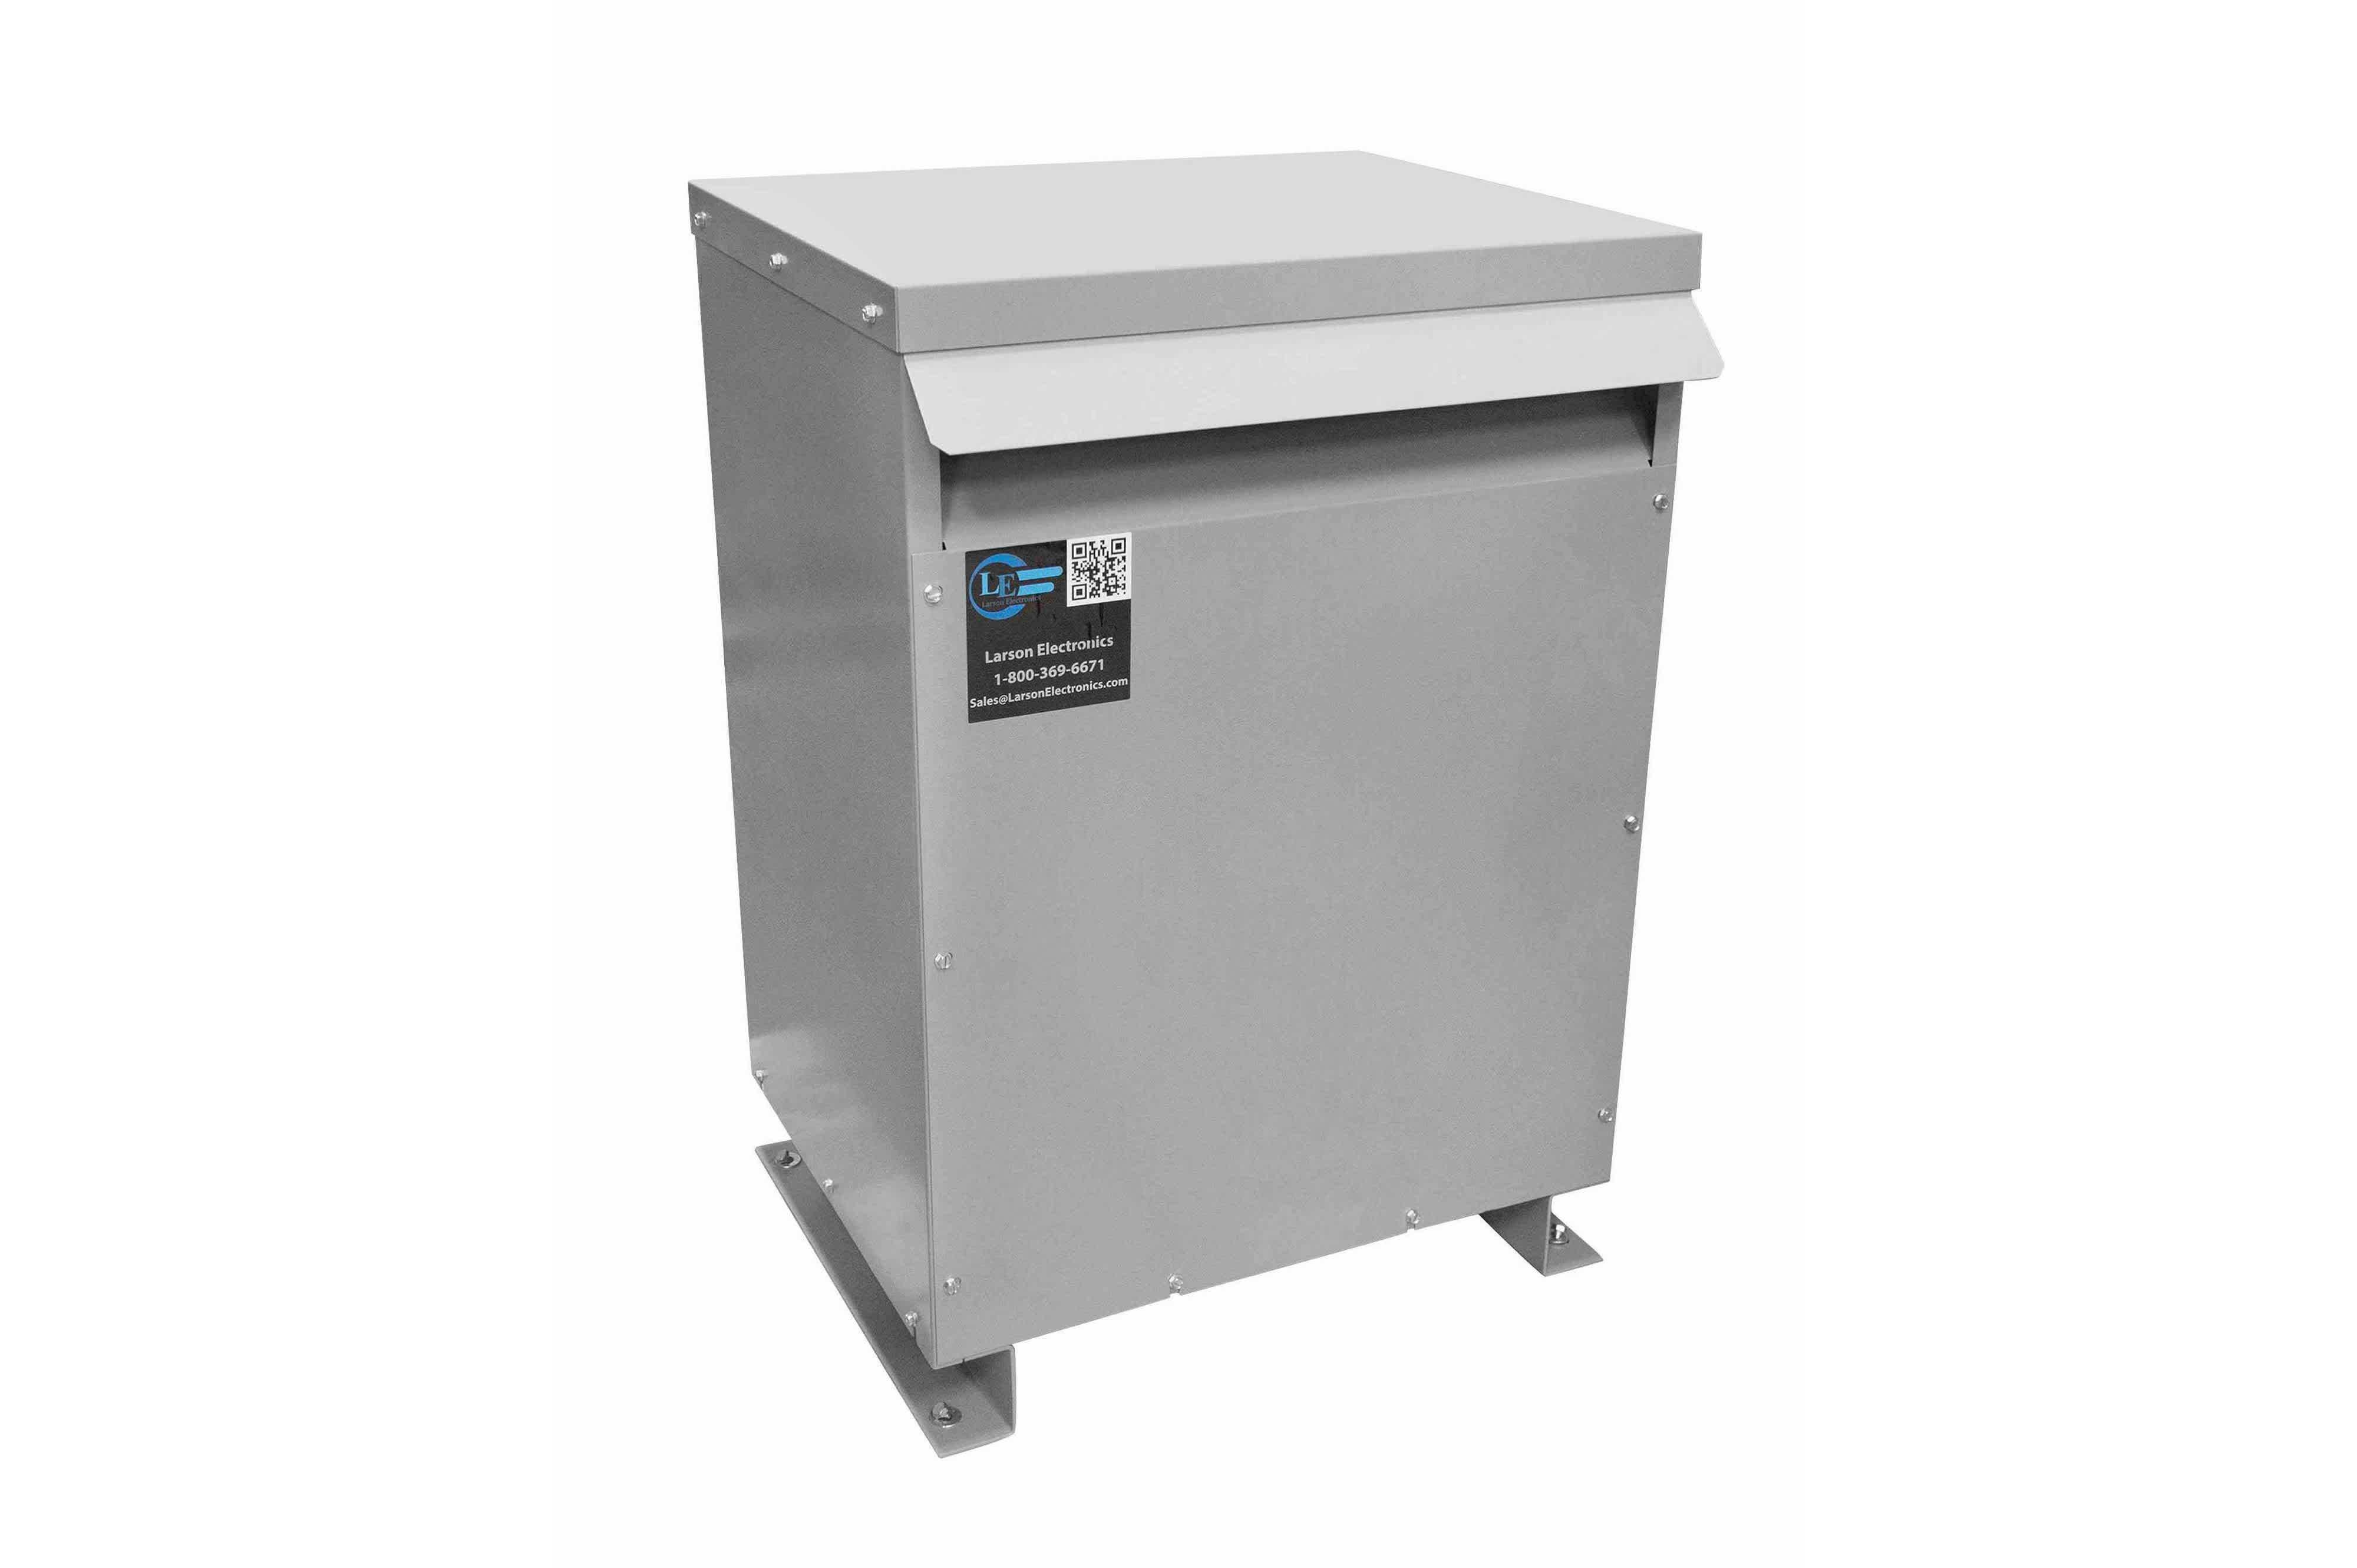 115 kVA 3PH Isolation Transformer, 208V Wye Primary, 208Y/120 Wye-N Secondary, N3R, Ventilated, 60 Hz